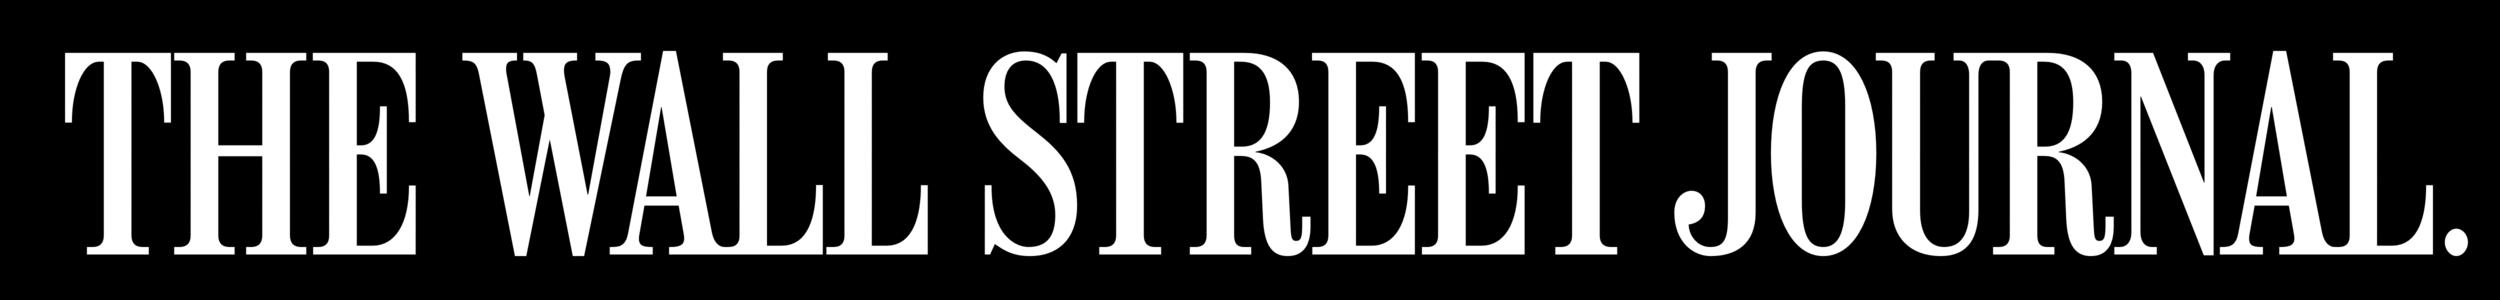 The_Wall_Street_Journal_logo_black.png